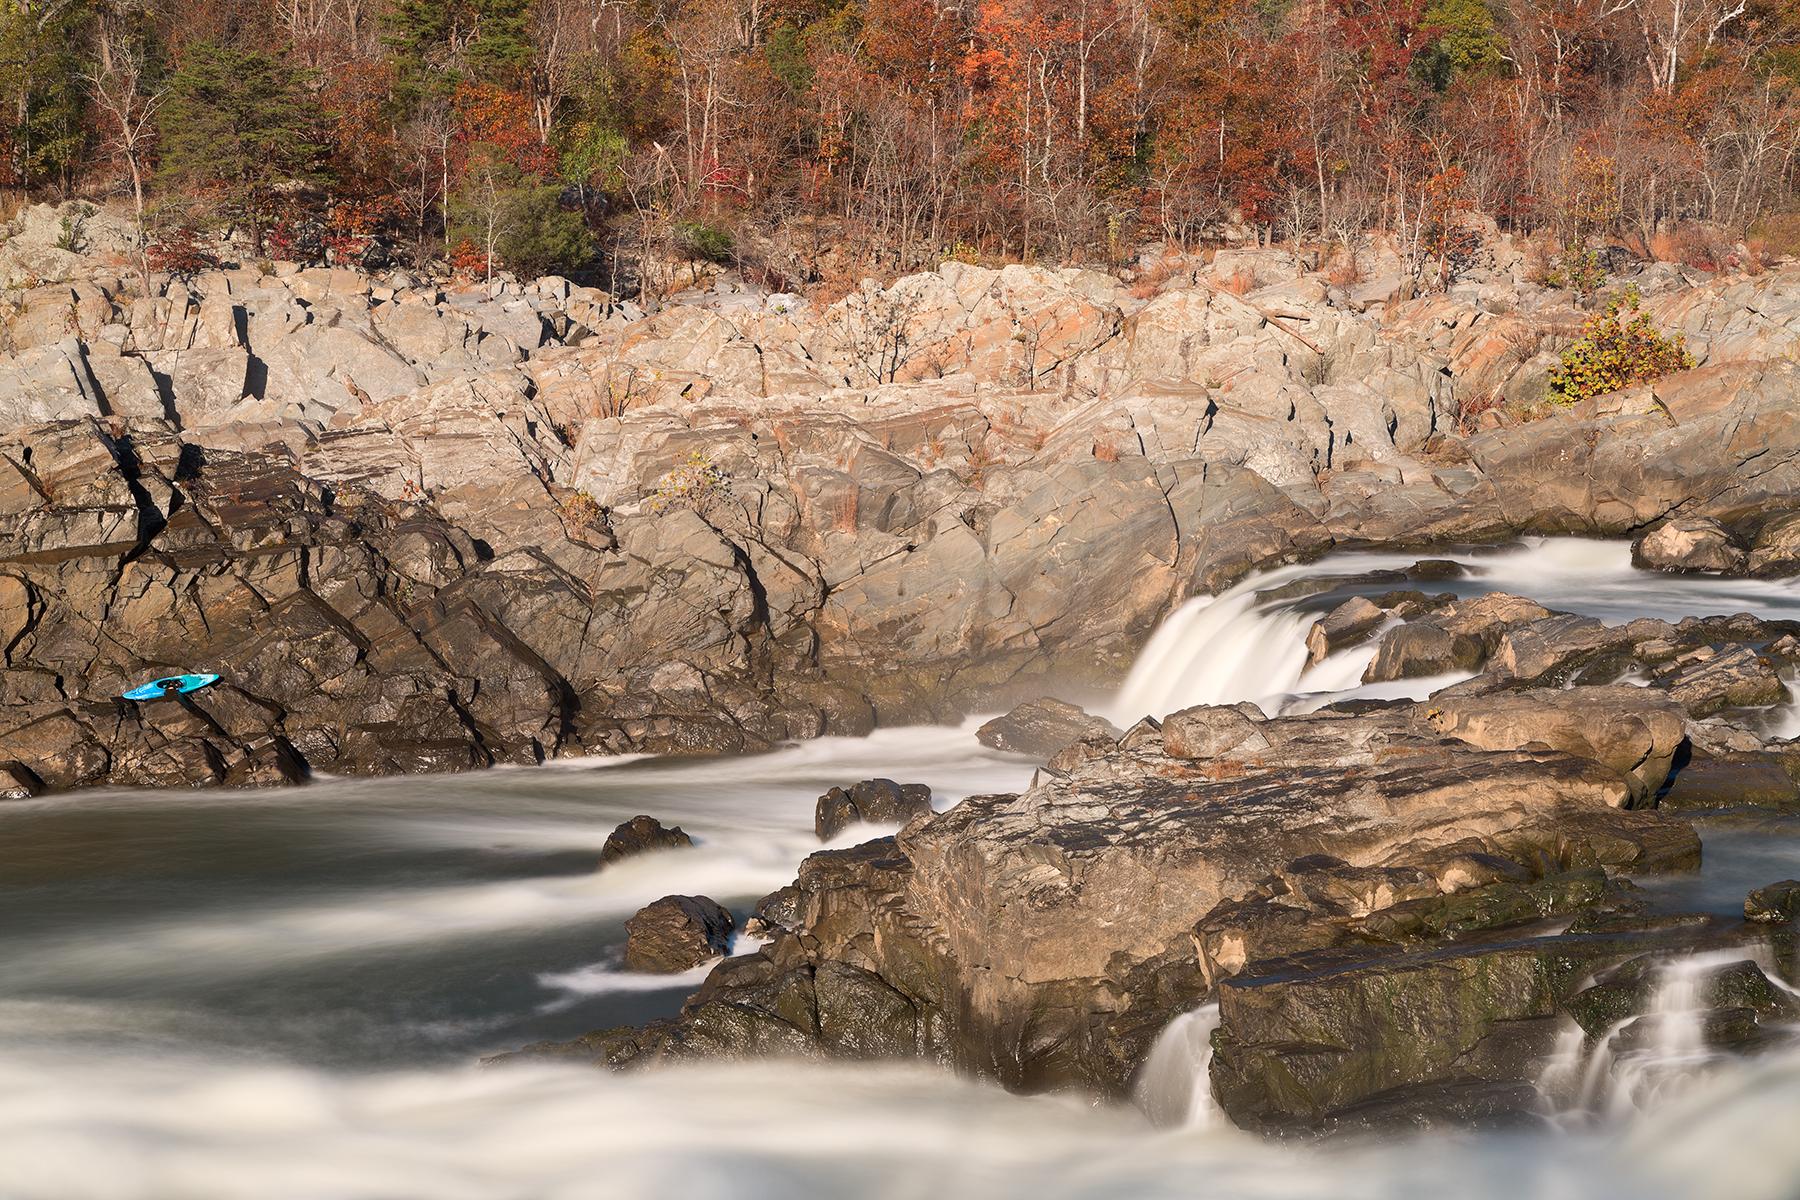 Great autumn falls photo